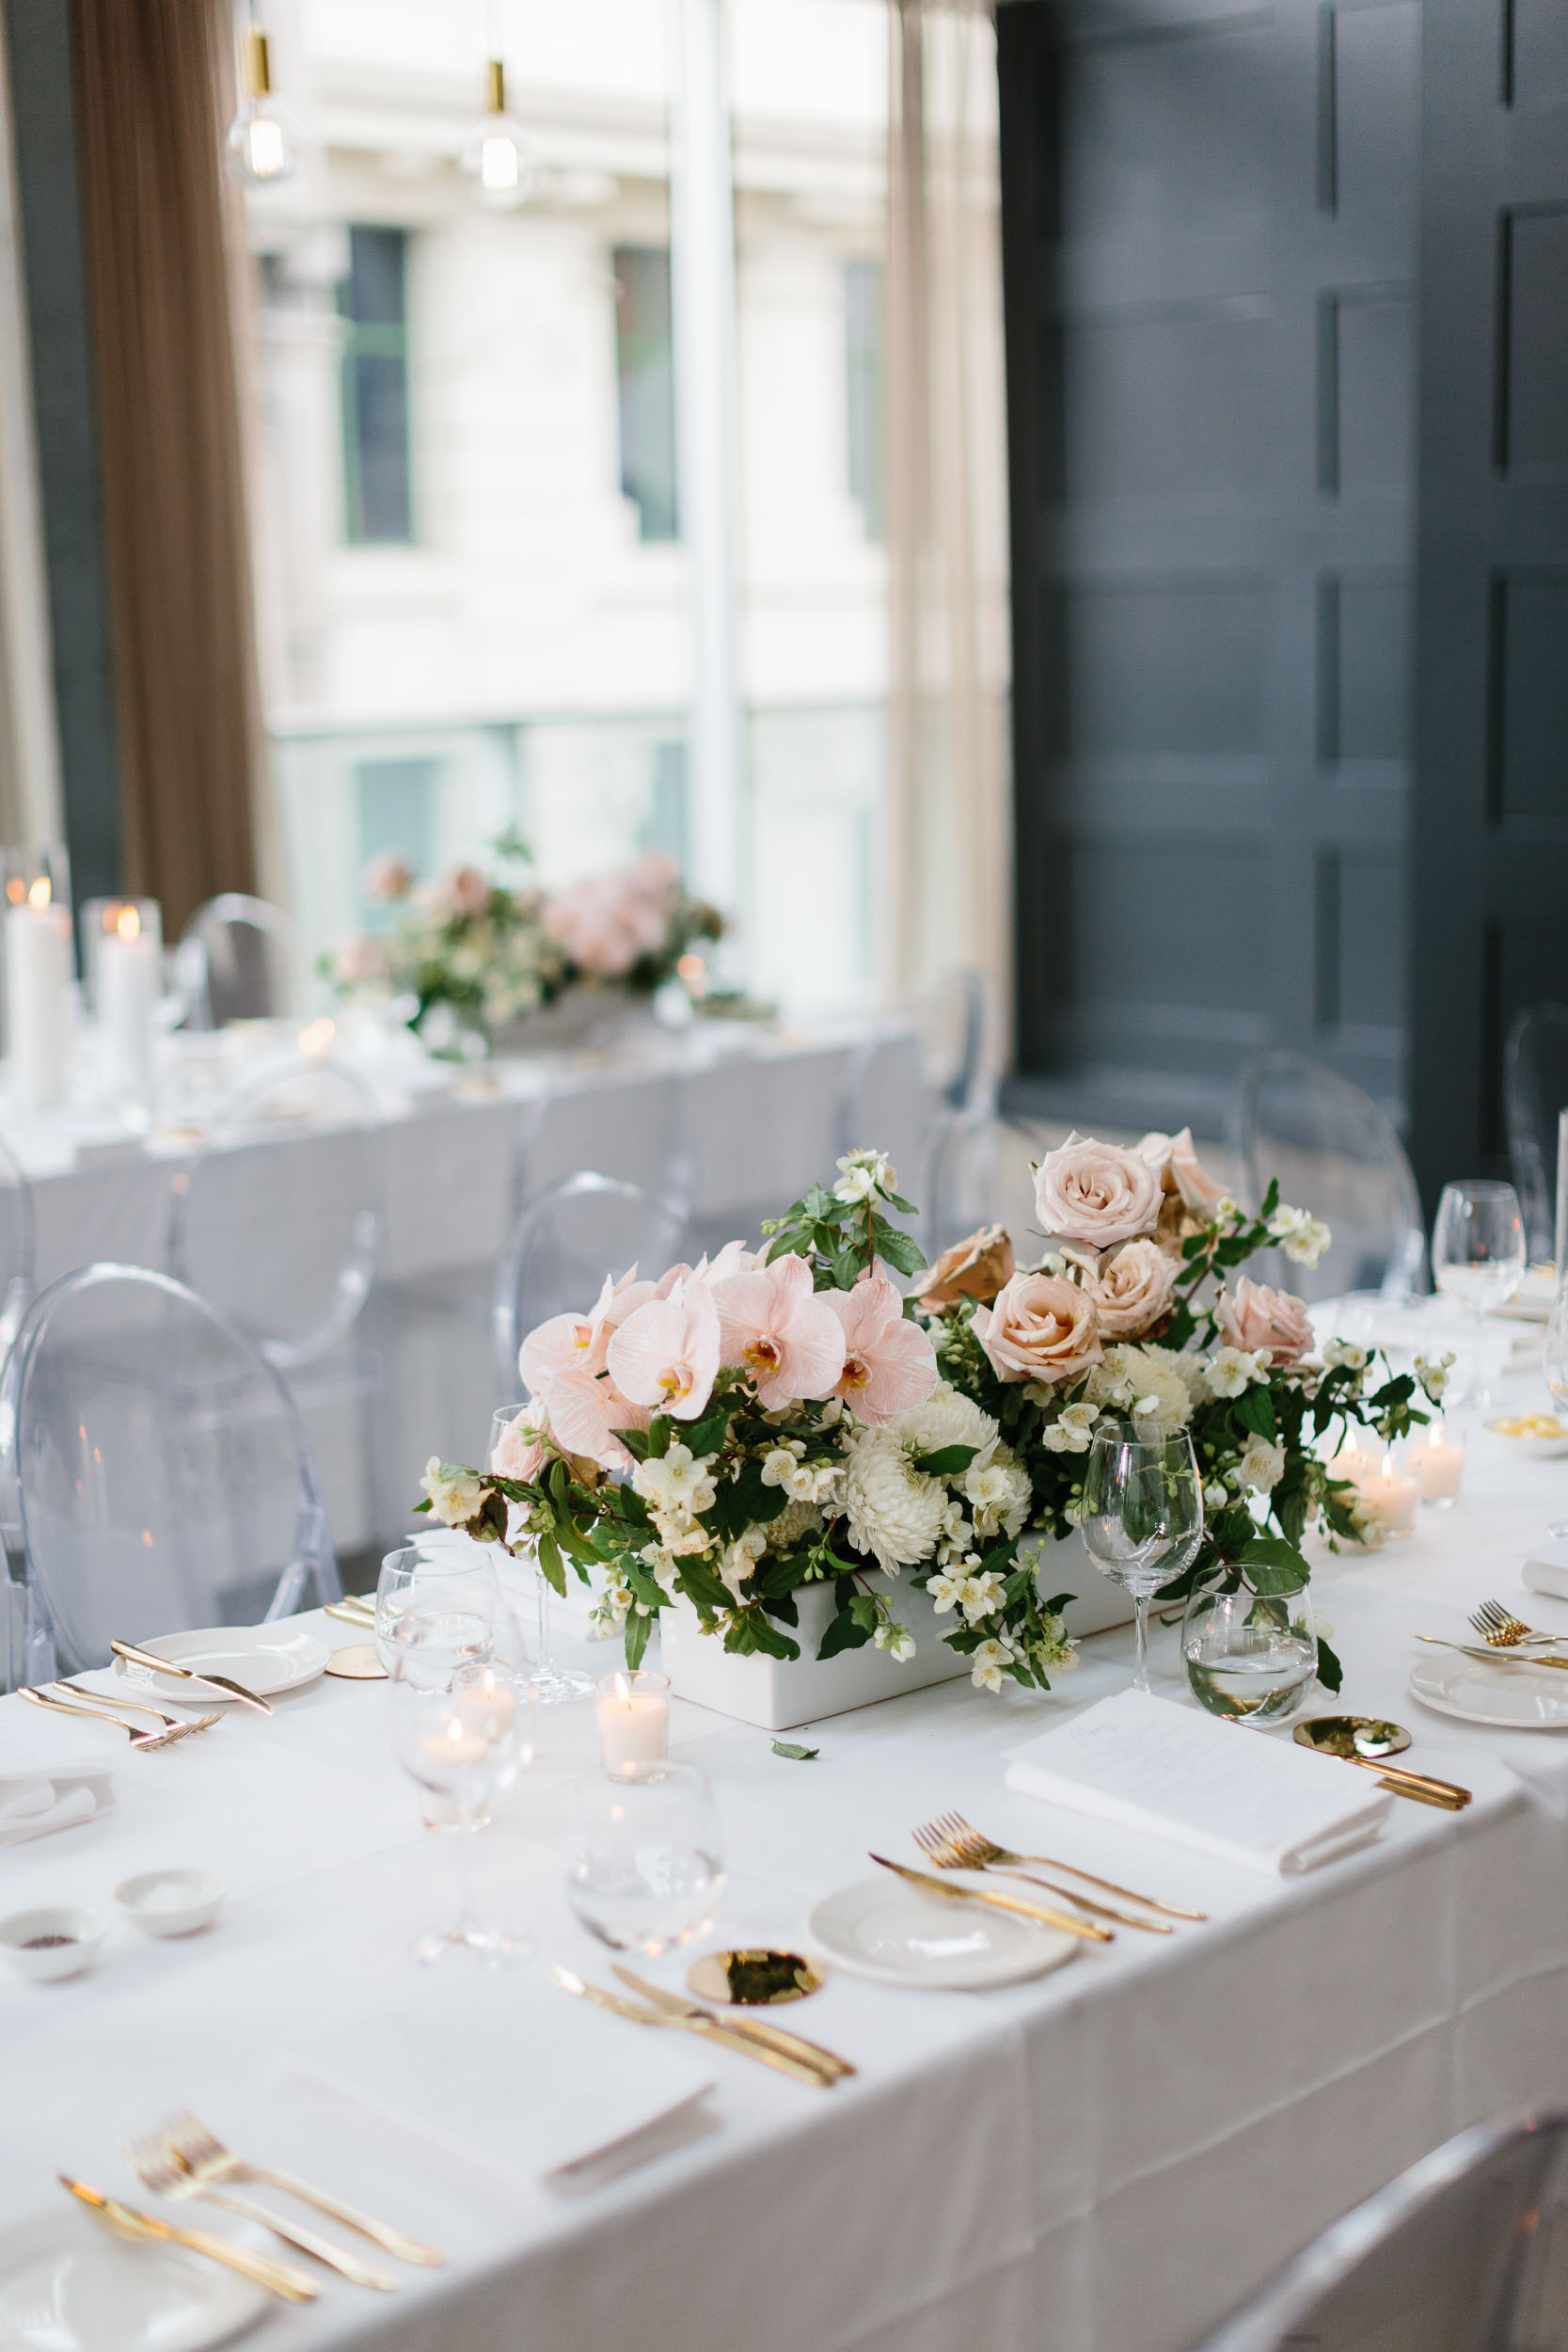 Kas-Richards-Wedding-Photographer-Melbourne-City-Wedding-Alto-Event-Space-Jane-Hill-Bridal-Gown-38.jpg